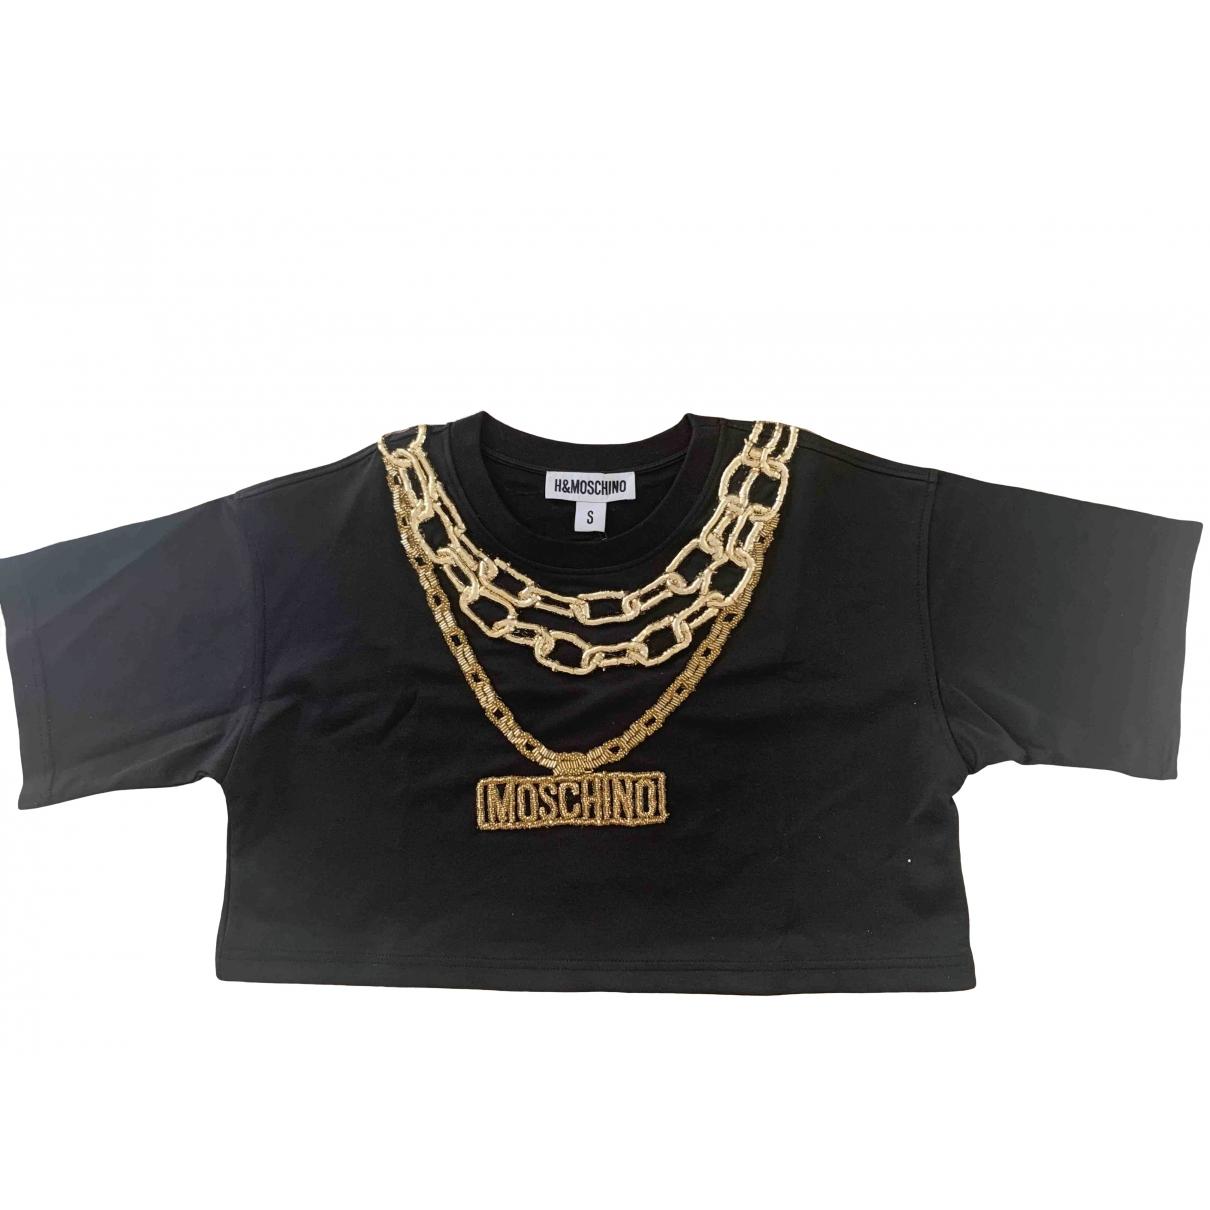 Camiseta Moschino For H&m